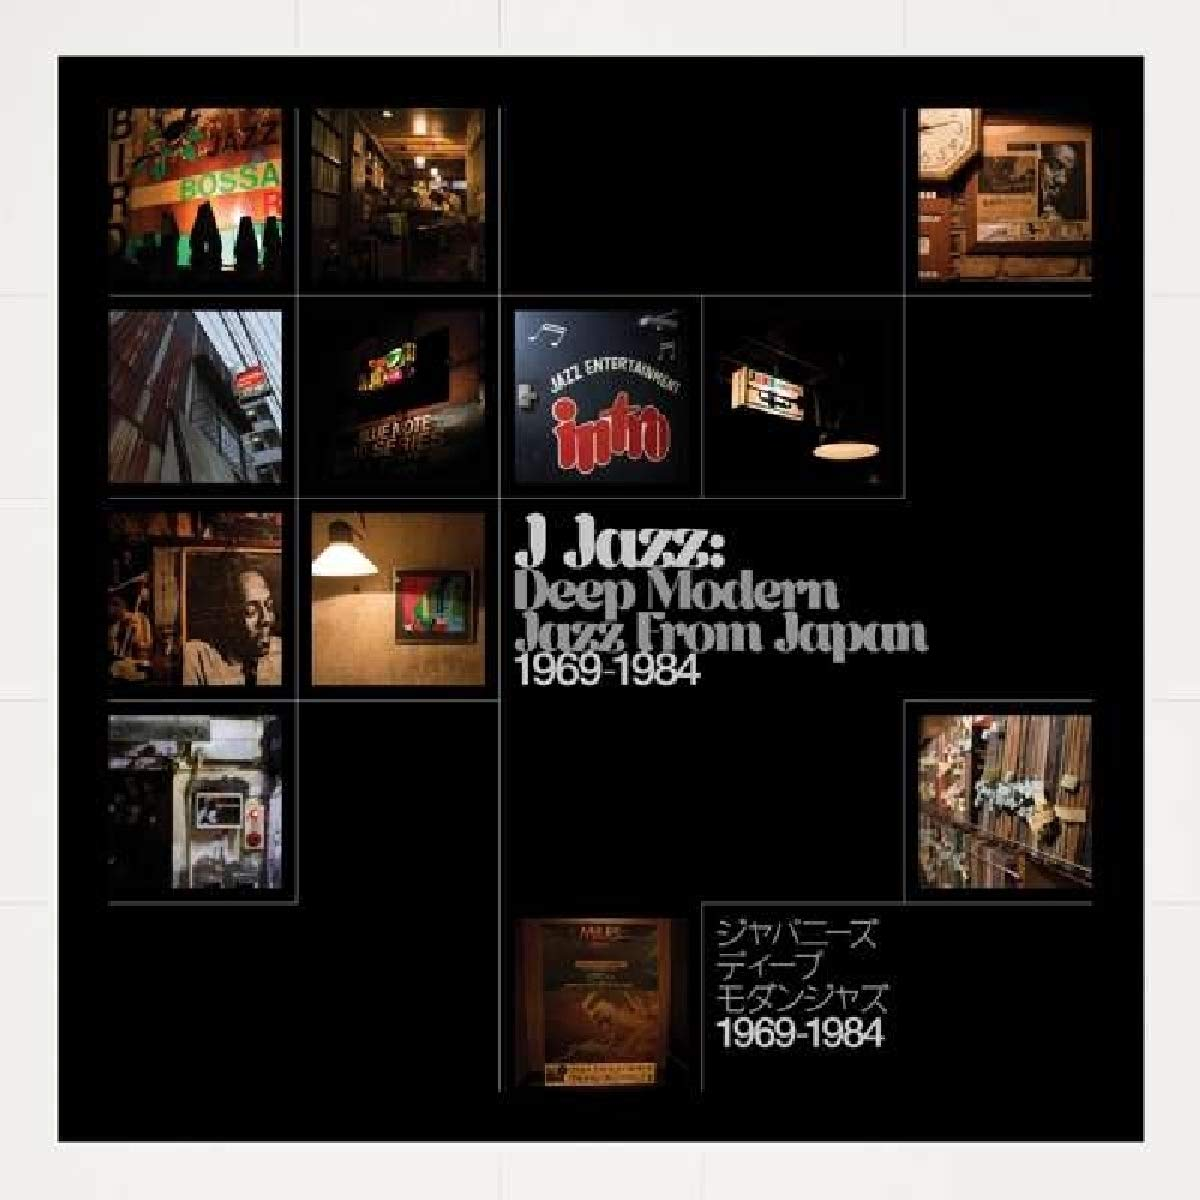 J-Jazz - Deep Modern Jazz from Japan 1969-1984 by Bryan A Mchugh